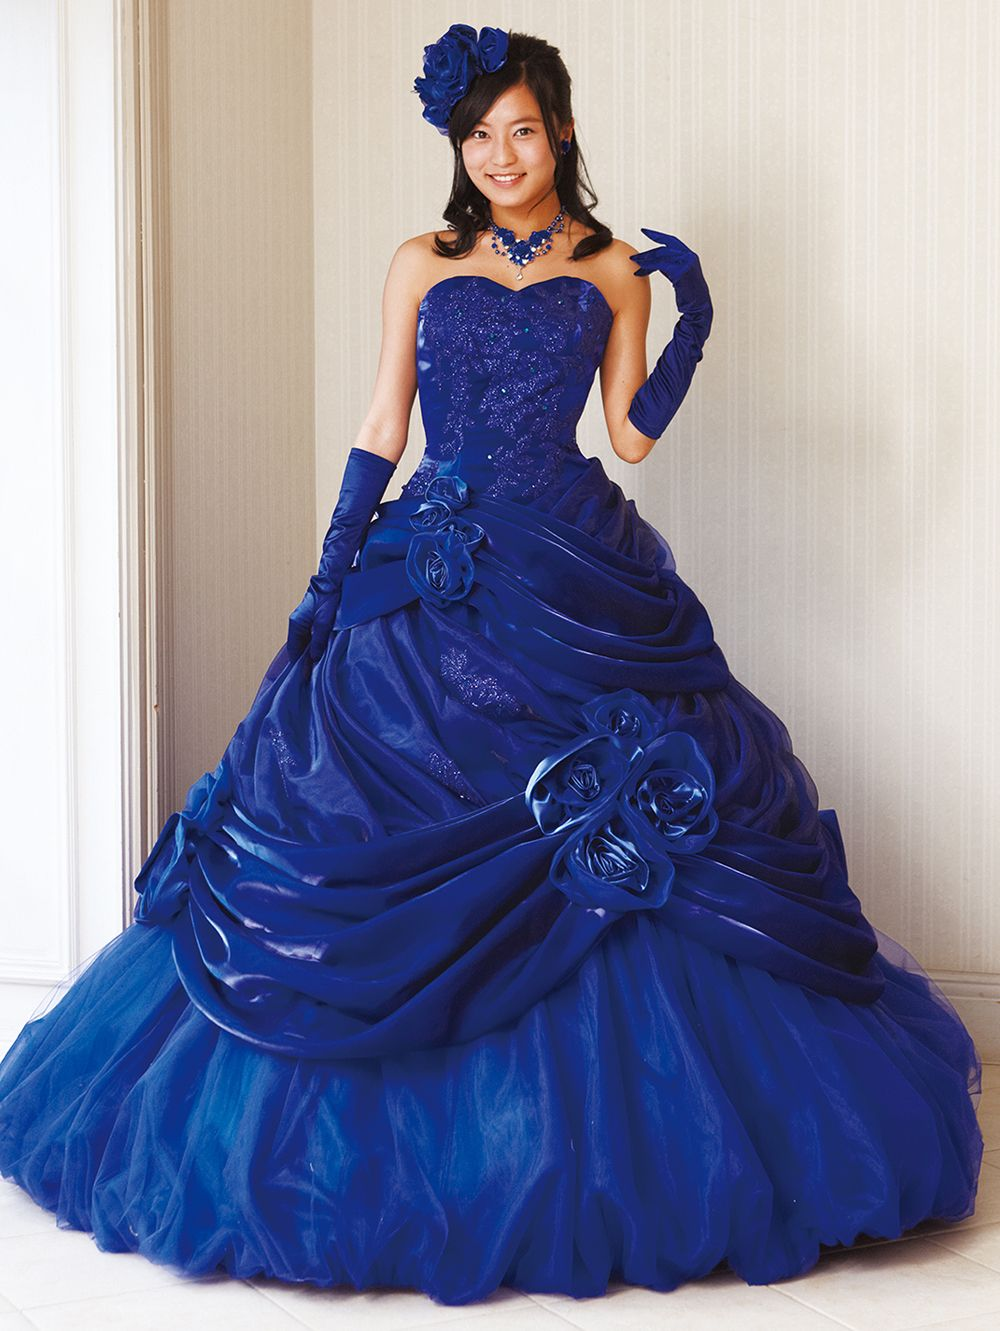 aya0151blue | ドレス 青, ドレススタイル, 夜会服